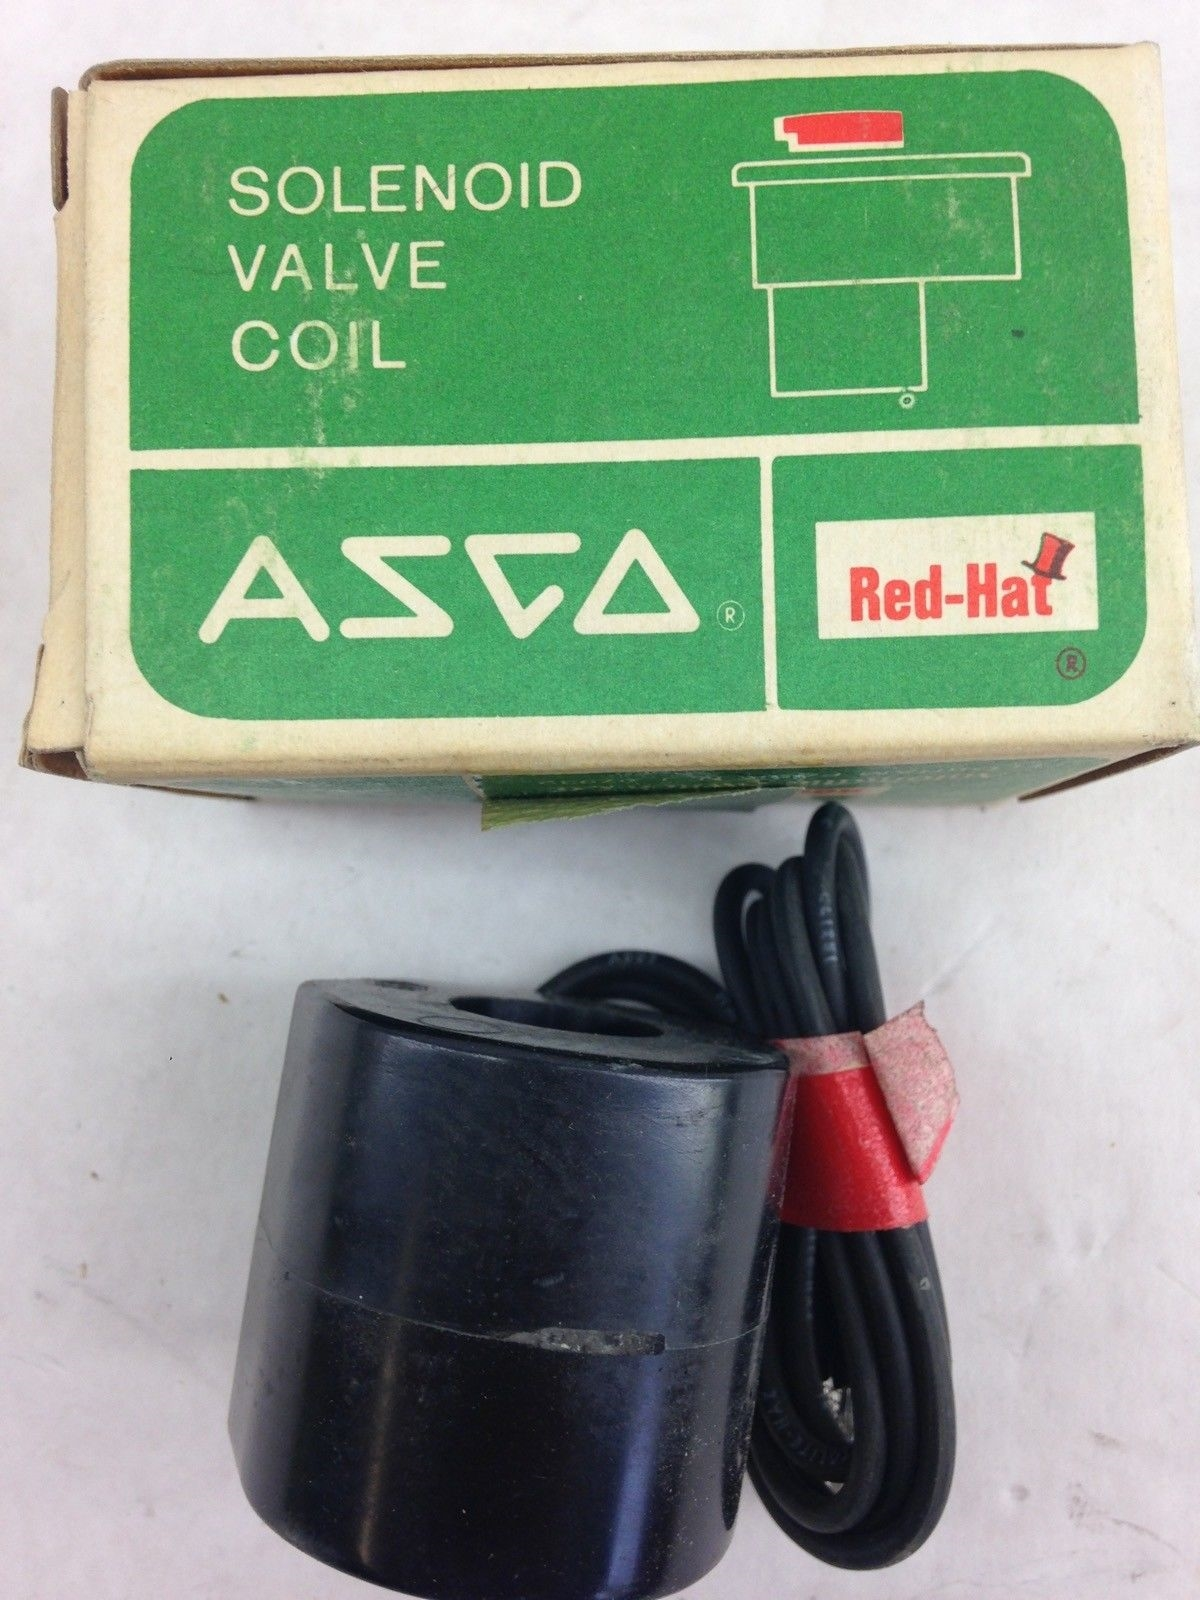 ASCO RED HAT 96-817-1-D SOLENOID VALVE COIL (F283) 1